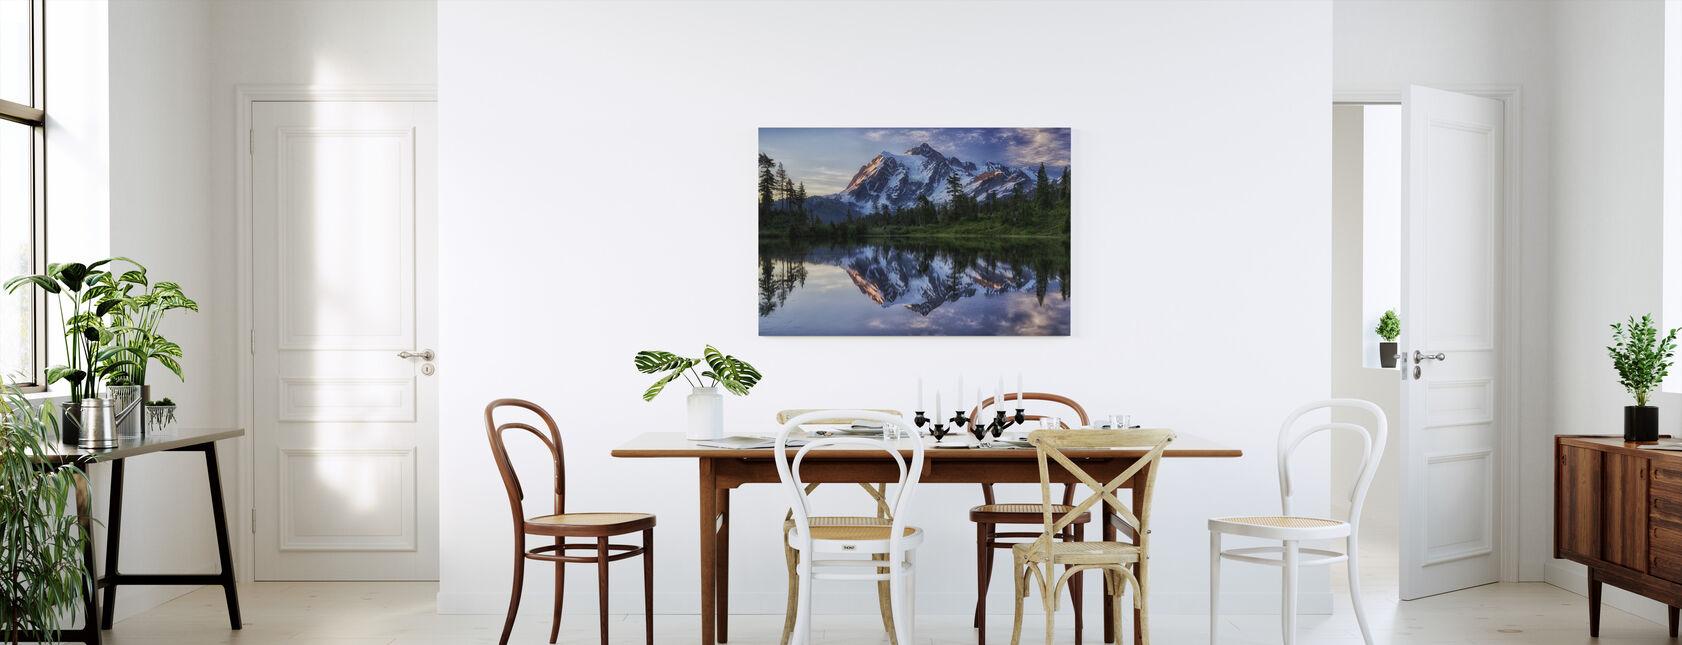 Soluppgång på Mount Shuksan, Washington, USA - Canvastavla - Kök